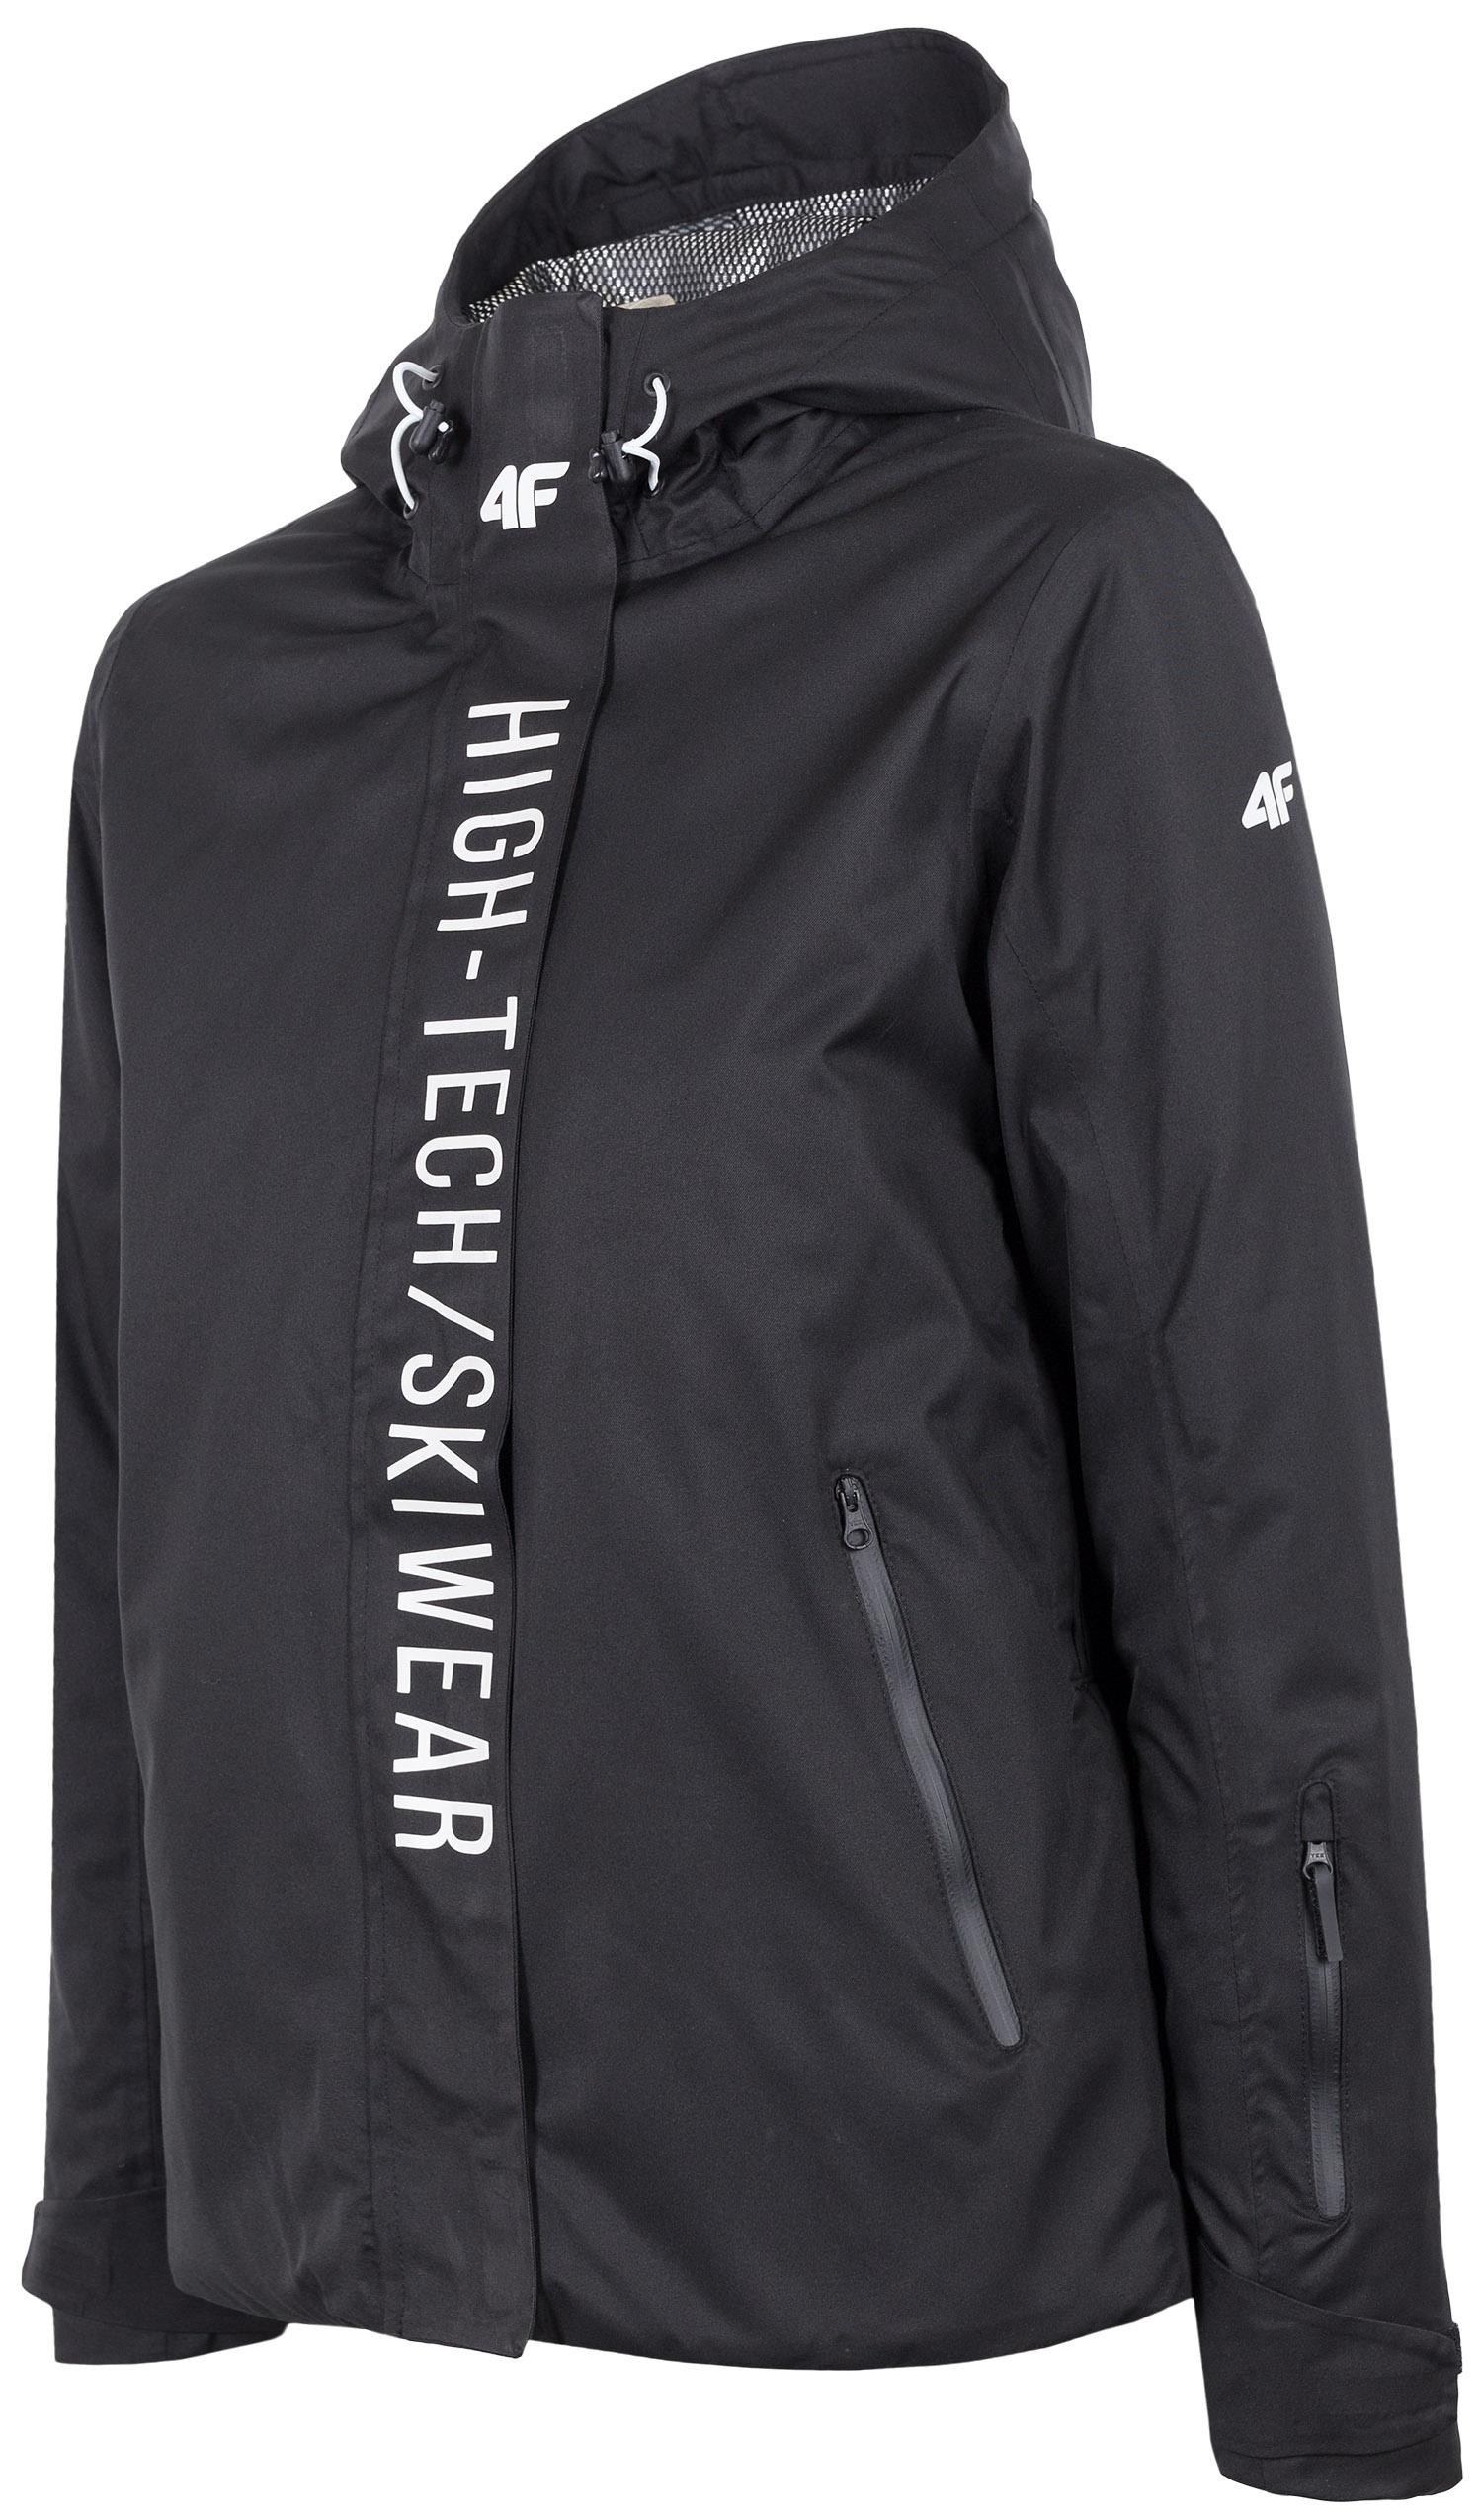 43334ed5d4df Dámska lyžiarska bunda KUDN162 - čierna